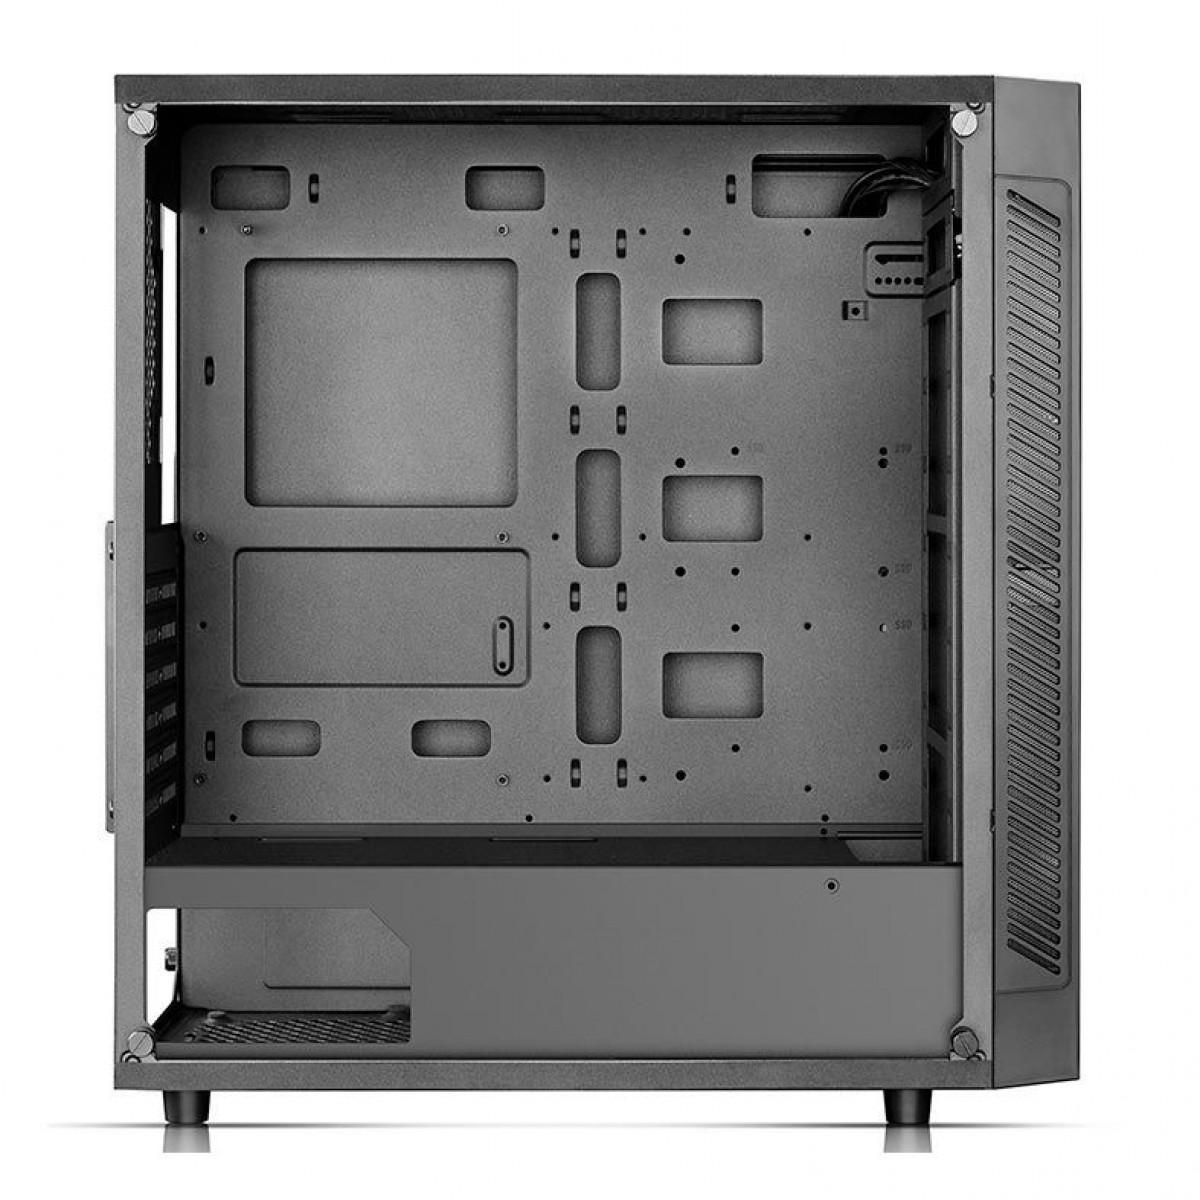 Gabinete Gamer DeepCool Matrexx 55 V3, Mid Tower, ARGB, Vidro Temperado, Black, DP-ATX-MATREXX55-AR-3F, Sem Fonte, Com 3 Fans